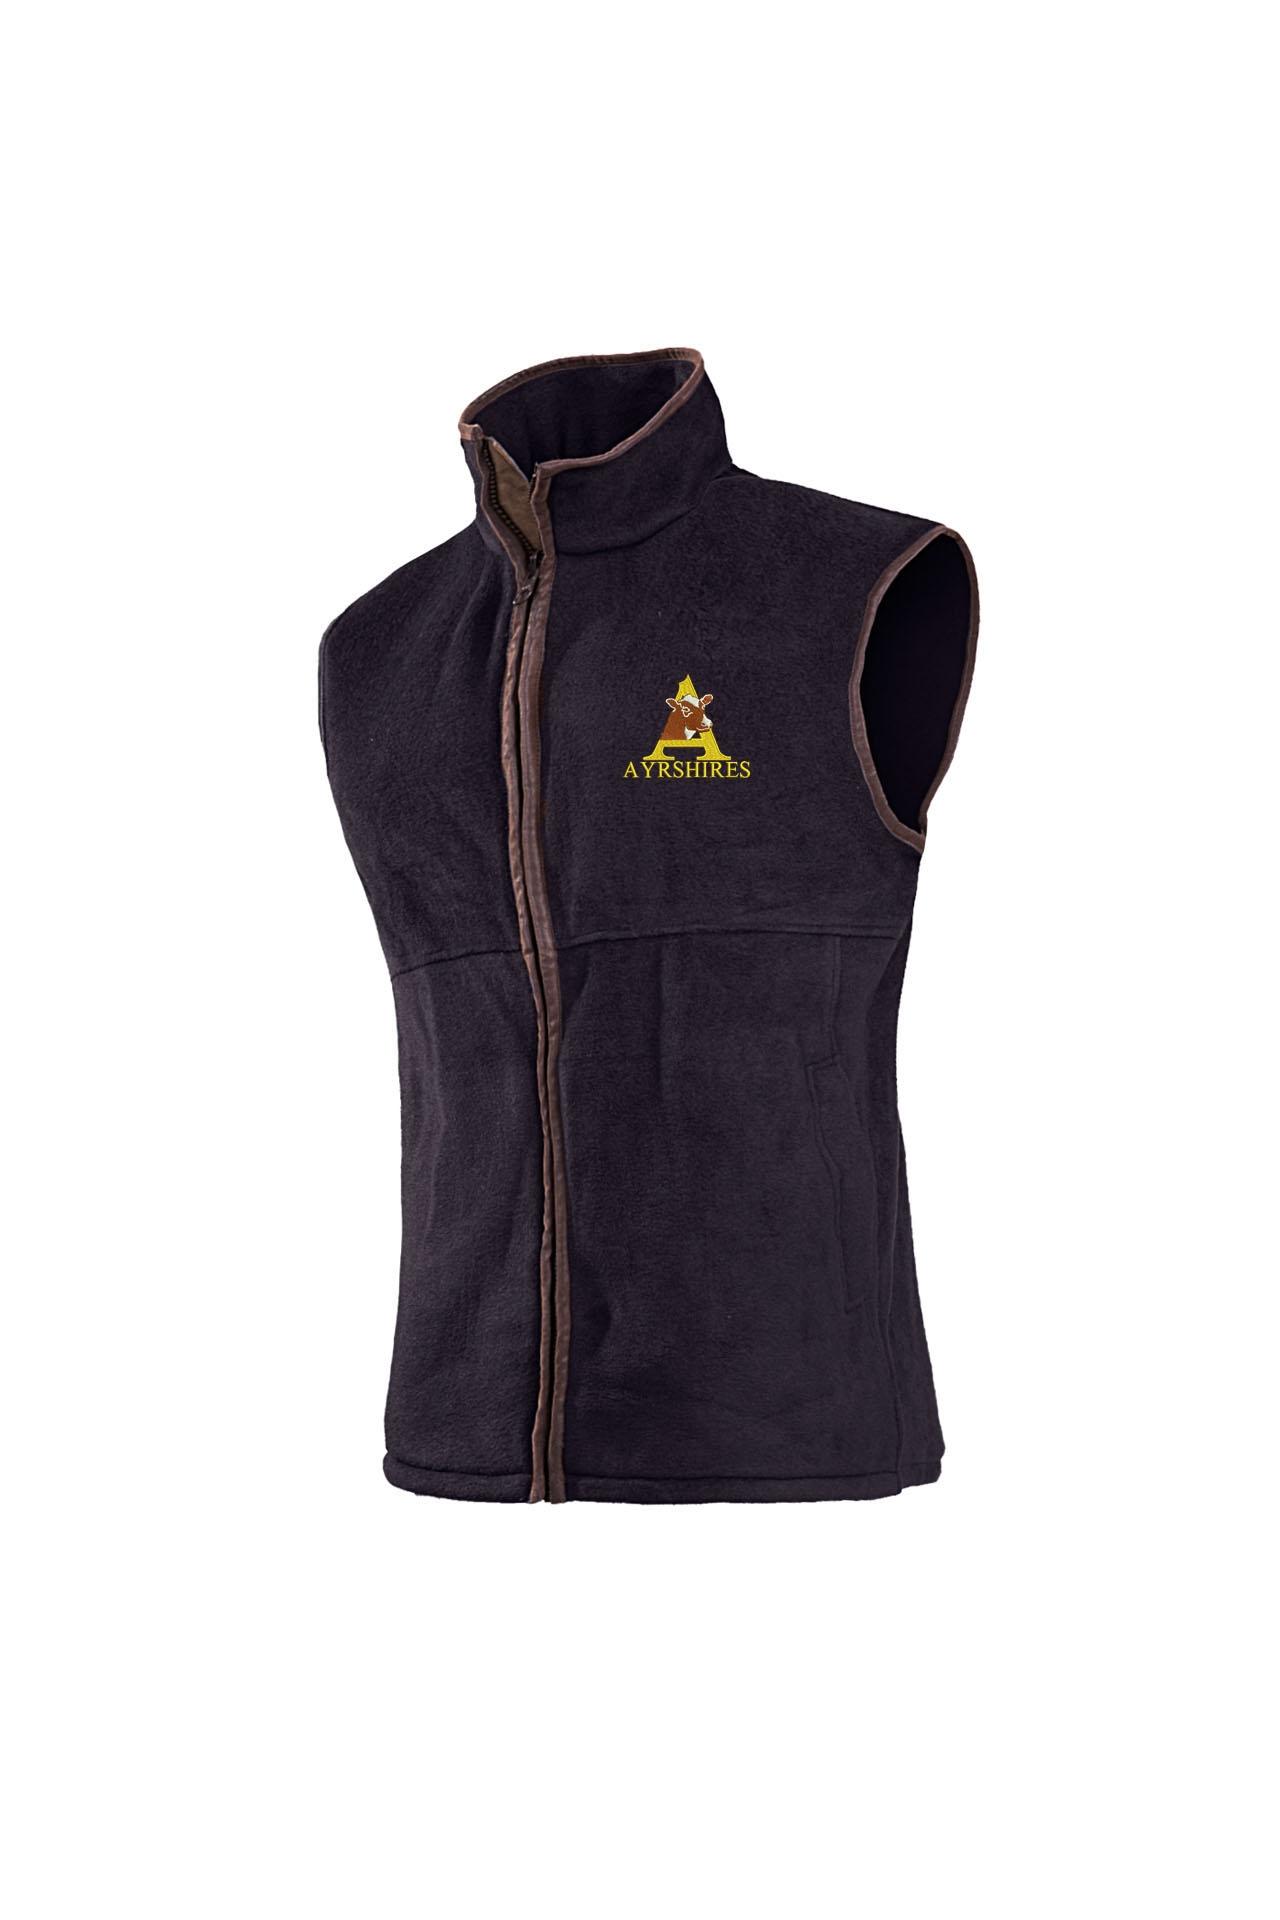 Ayrshire Cattle Society Stenton Ladies Gilet